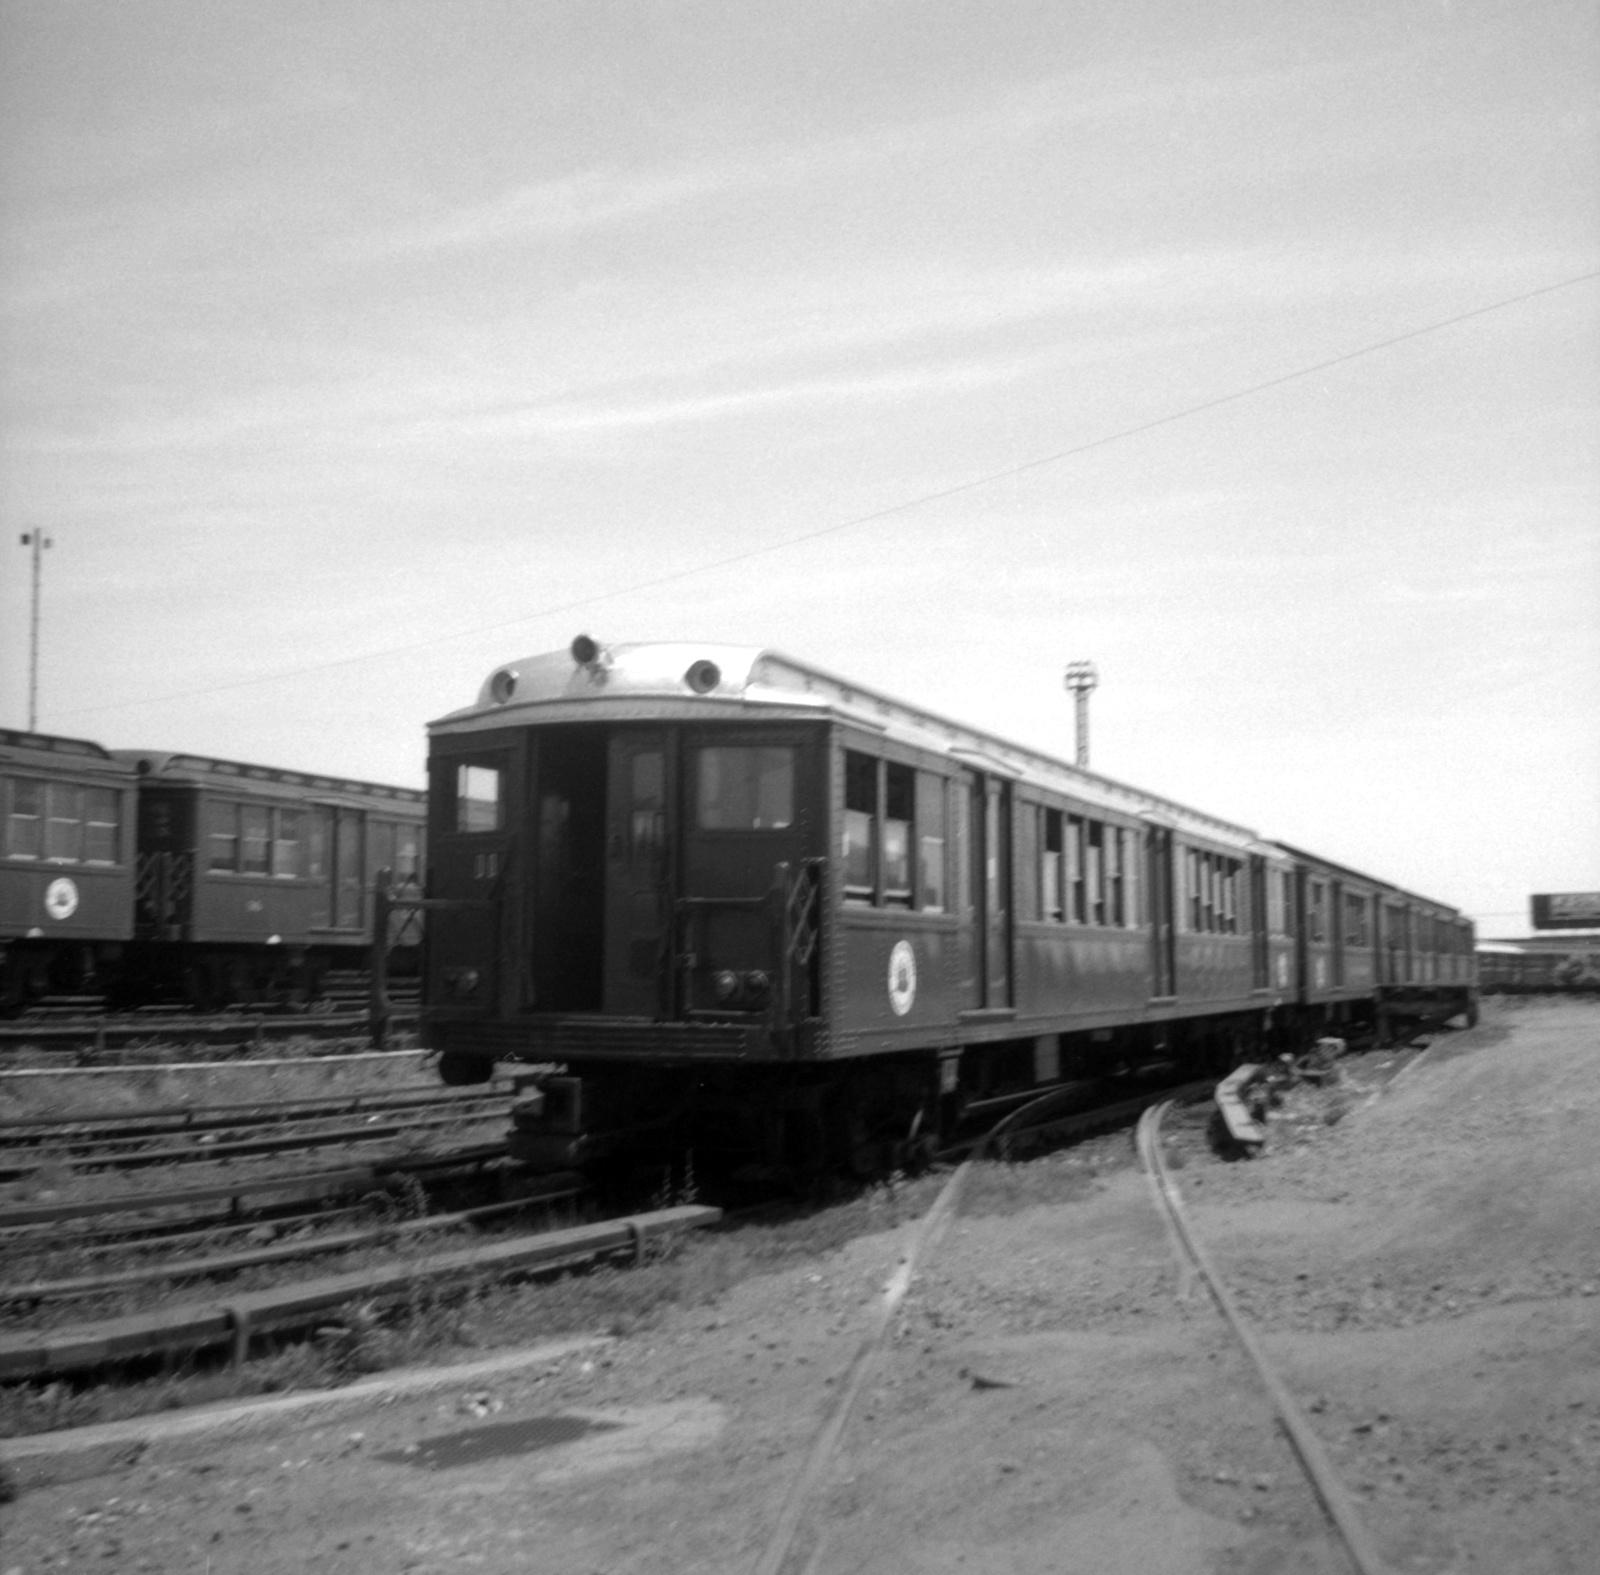 (517k, 1600x1575)<br><b>Country:</b> United States<br><b>City:</b> Philadelphia, PA<br><b>System:</b> SEPTA (or Predecessor)<br><b>Line:</b> Broad Street Subway<br><b>Location:</b> Fern Rock Yard/Shops<br><b>Car:</b> PTC/SEPTA B-1 Broad Street (J.G. Brill, 1927-1928) 26 <br><b>Collection of:</b> David Pirmann<br><b>Date:</b> 6/11/1965<br><b>Viewed (this week/total):</b> 2 / 109